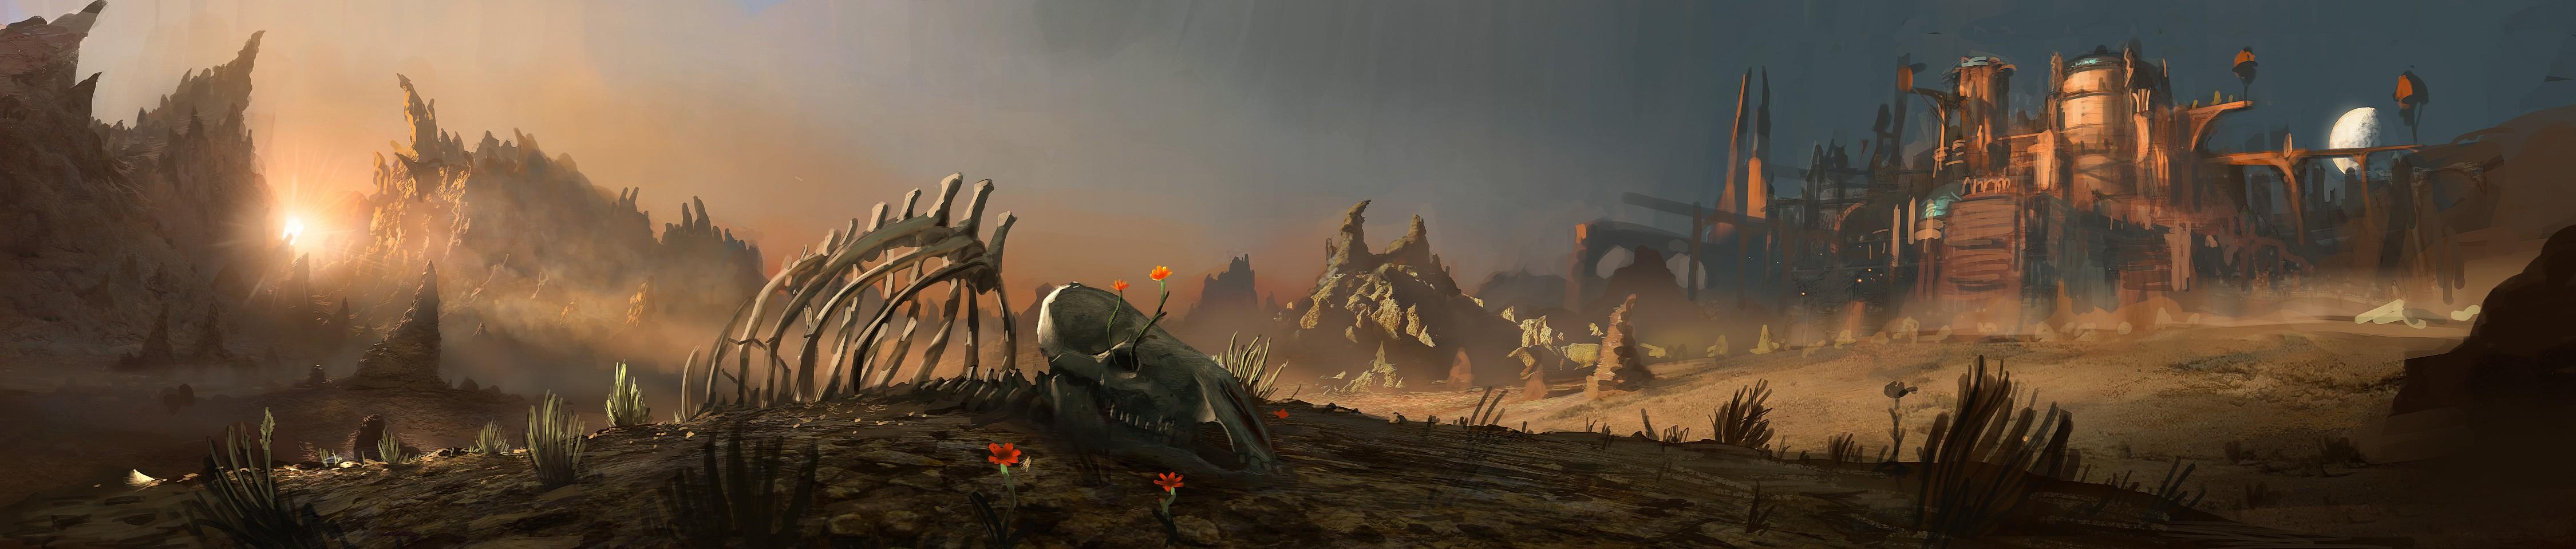 Смертоносная пустыня Аранох - Аранох (Aranoch) - Санктуарий - Diablo